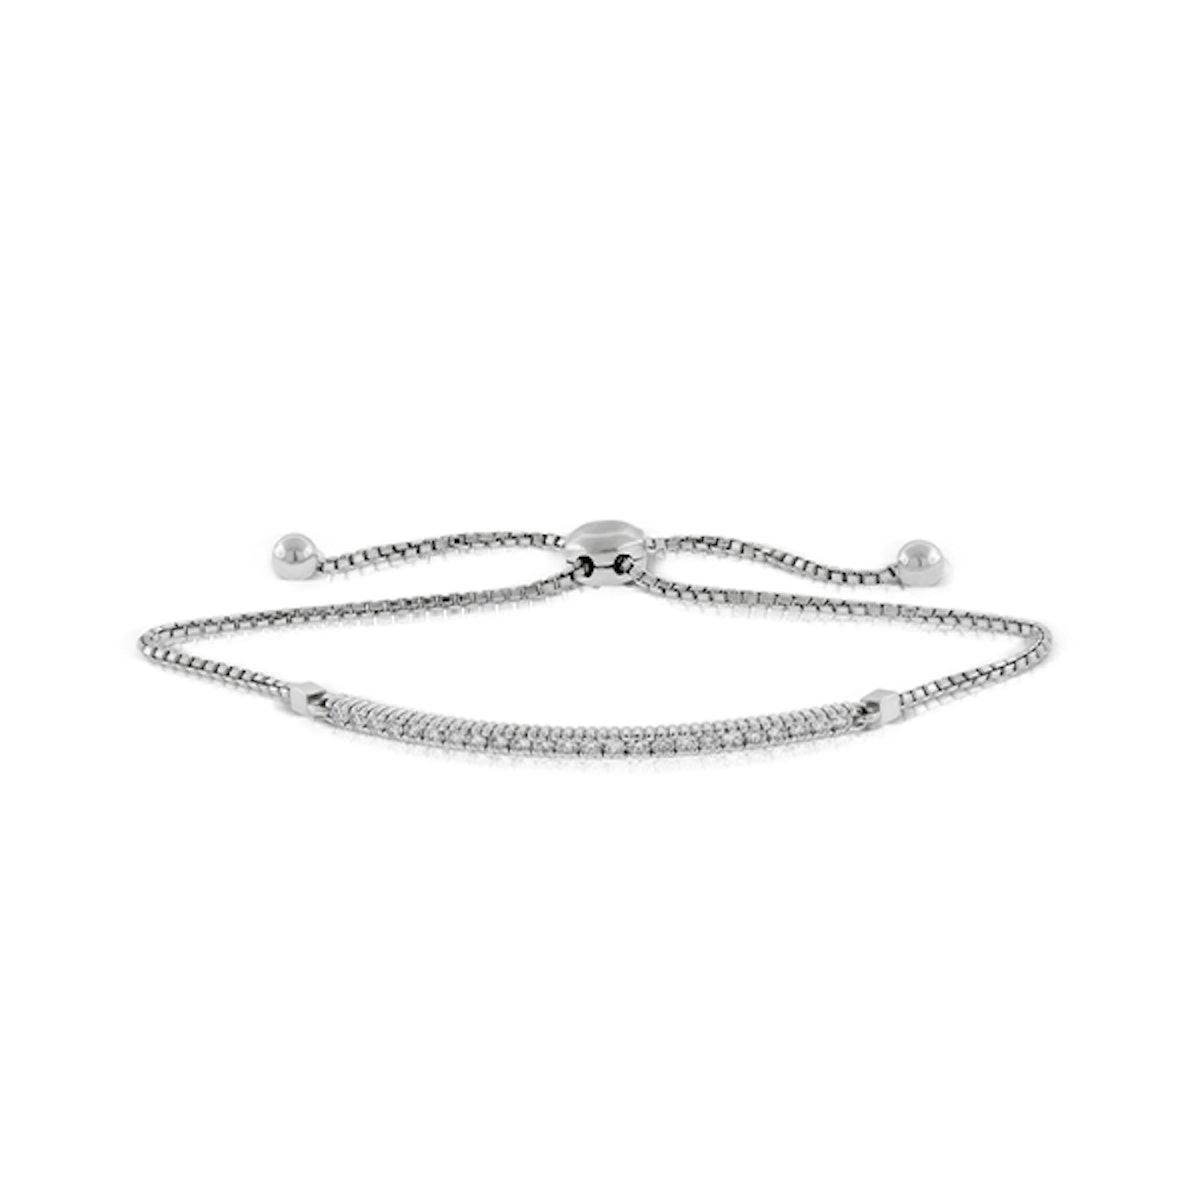 Diamond Bolo Bar Bracelet in 14K White Gold